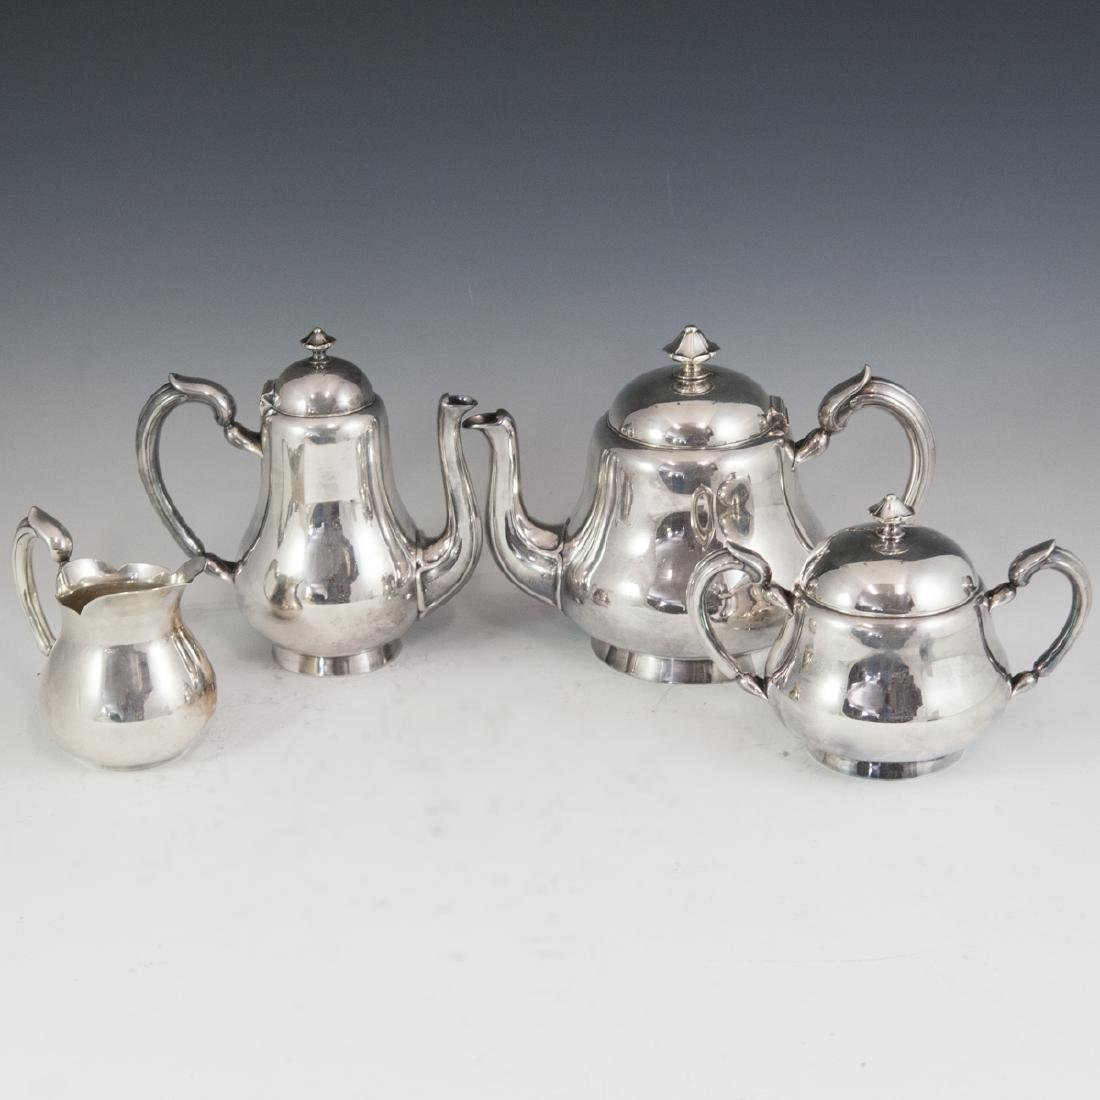 Antique Christofle Silverplated Tea Set